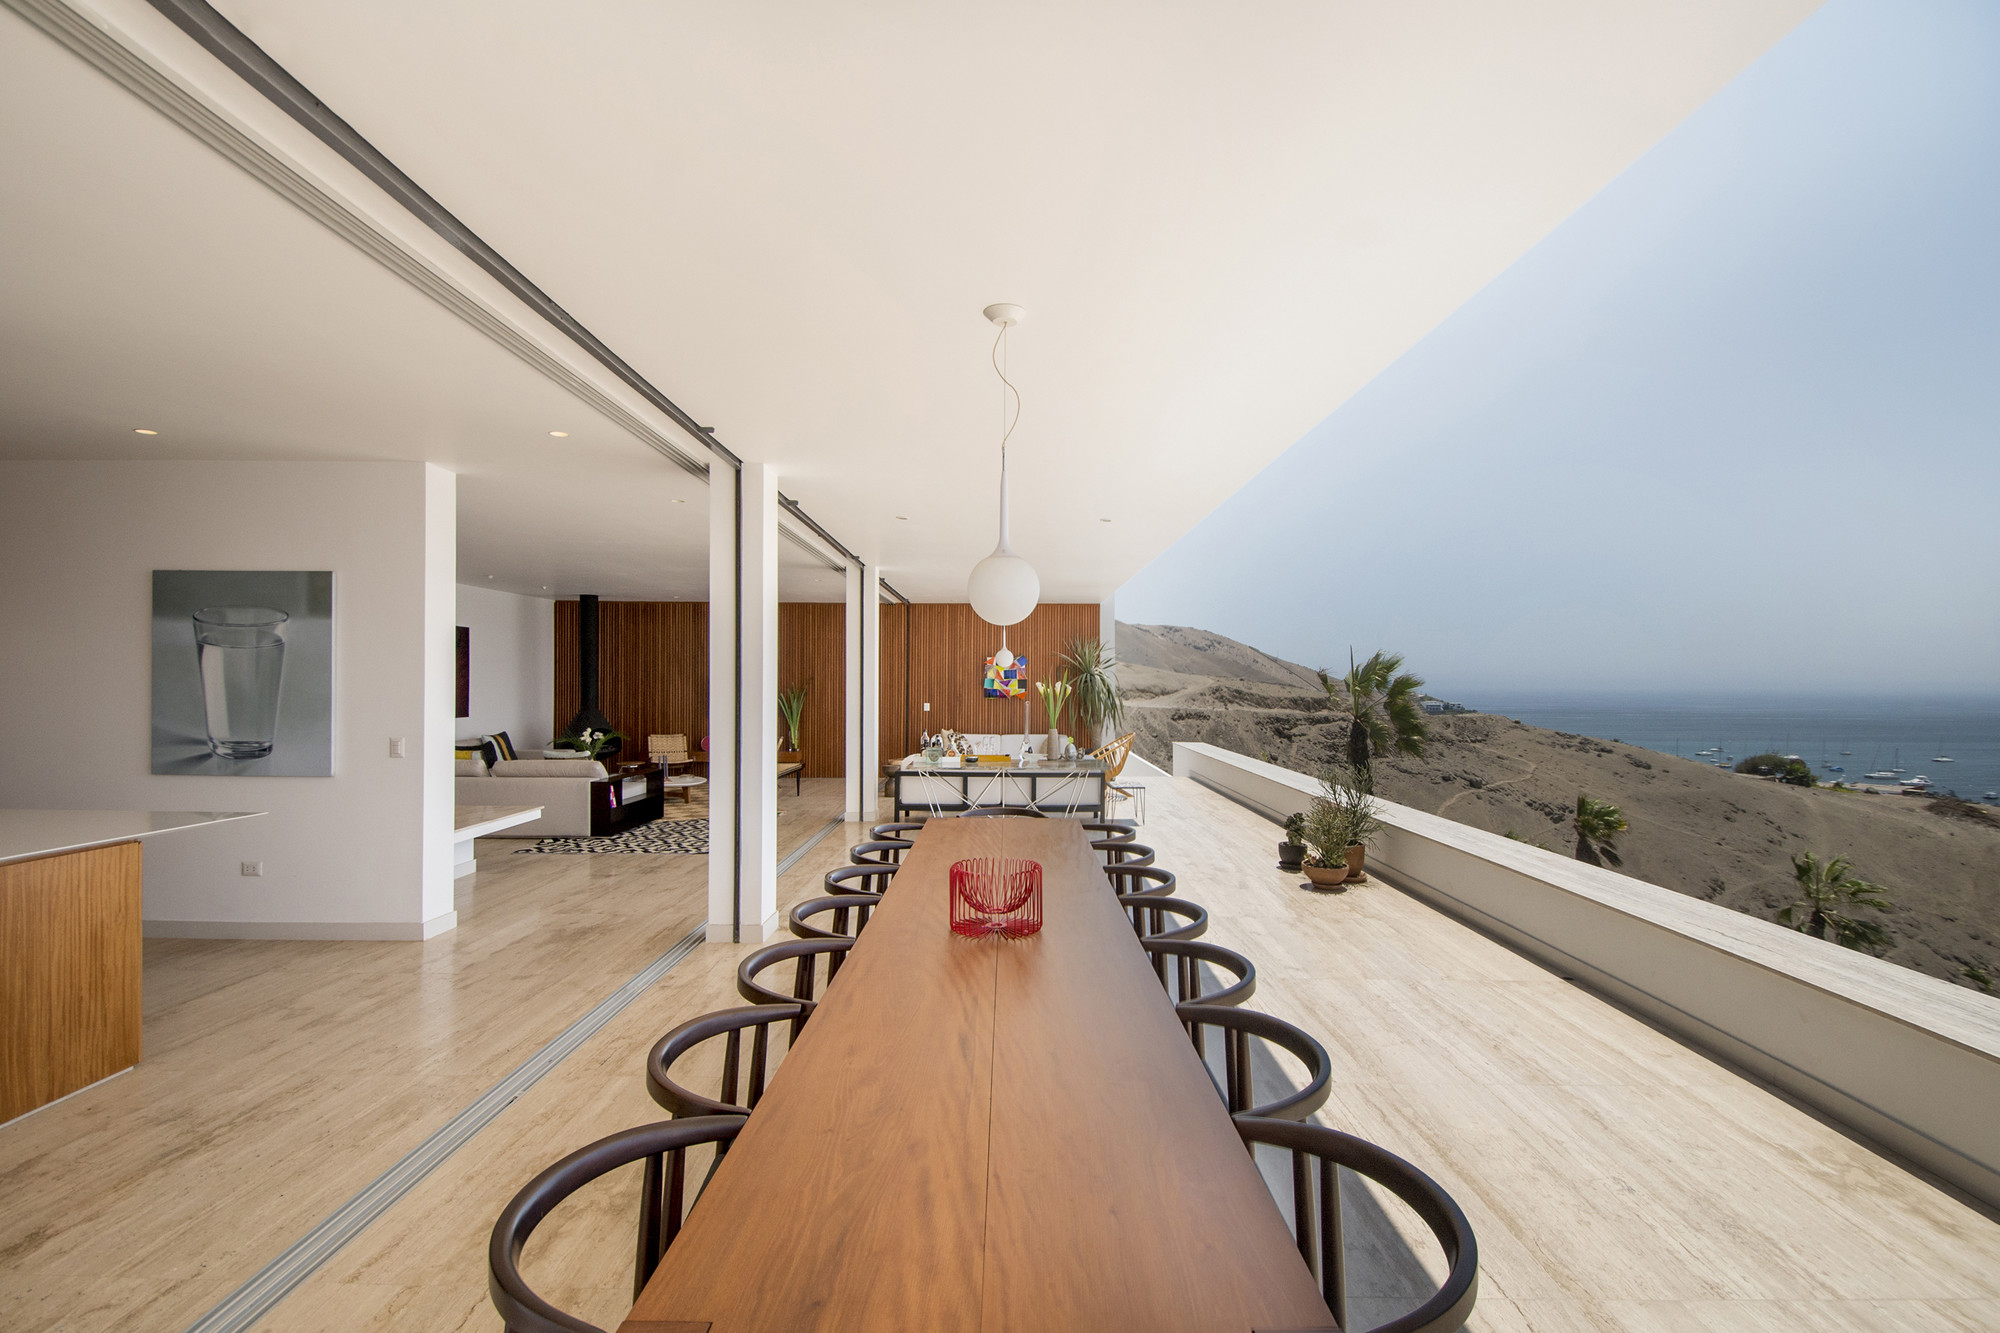 Casa en Ancón / Adrián Noboa Arquitecto, © Renzo Rebagliati